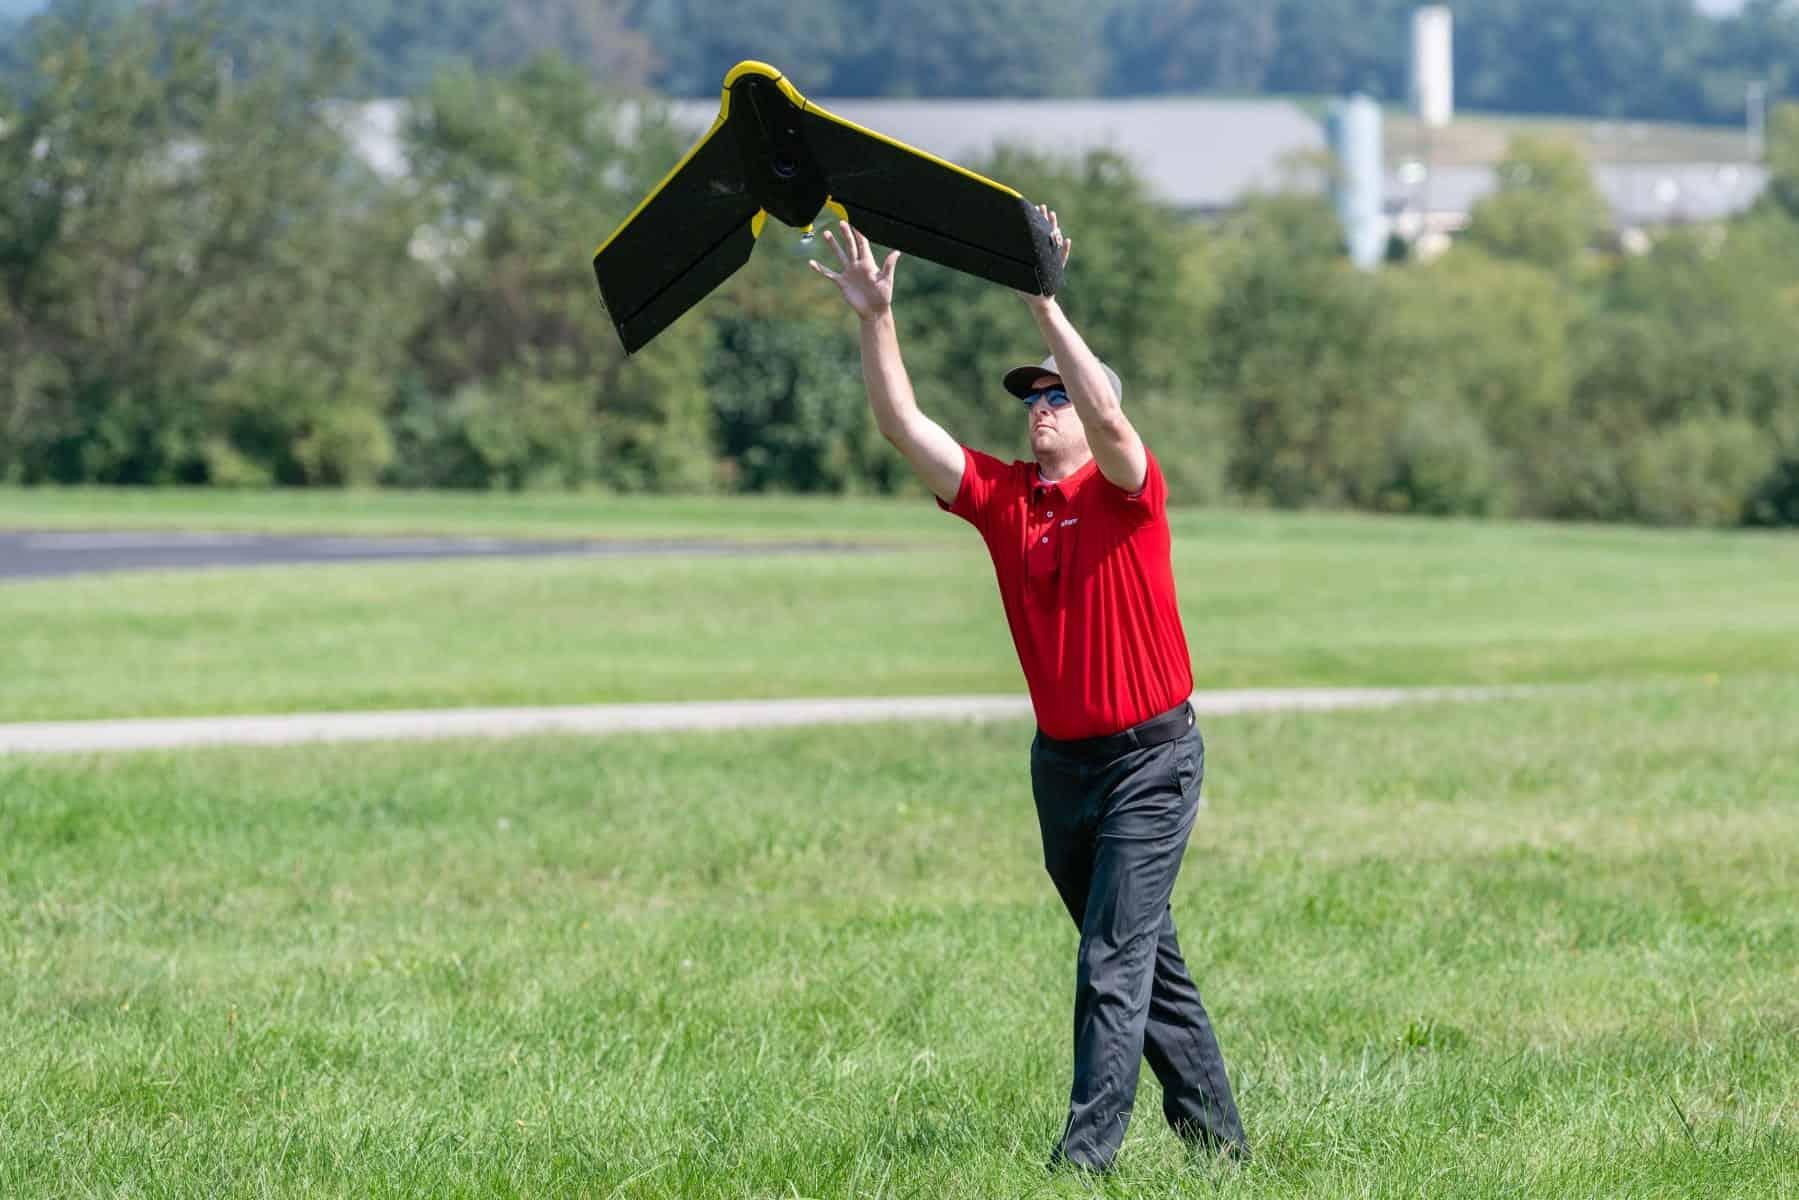 State Farm drone flight